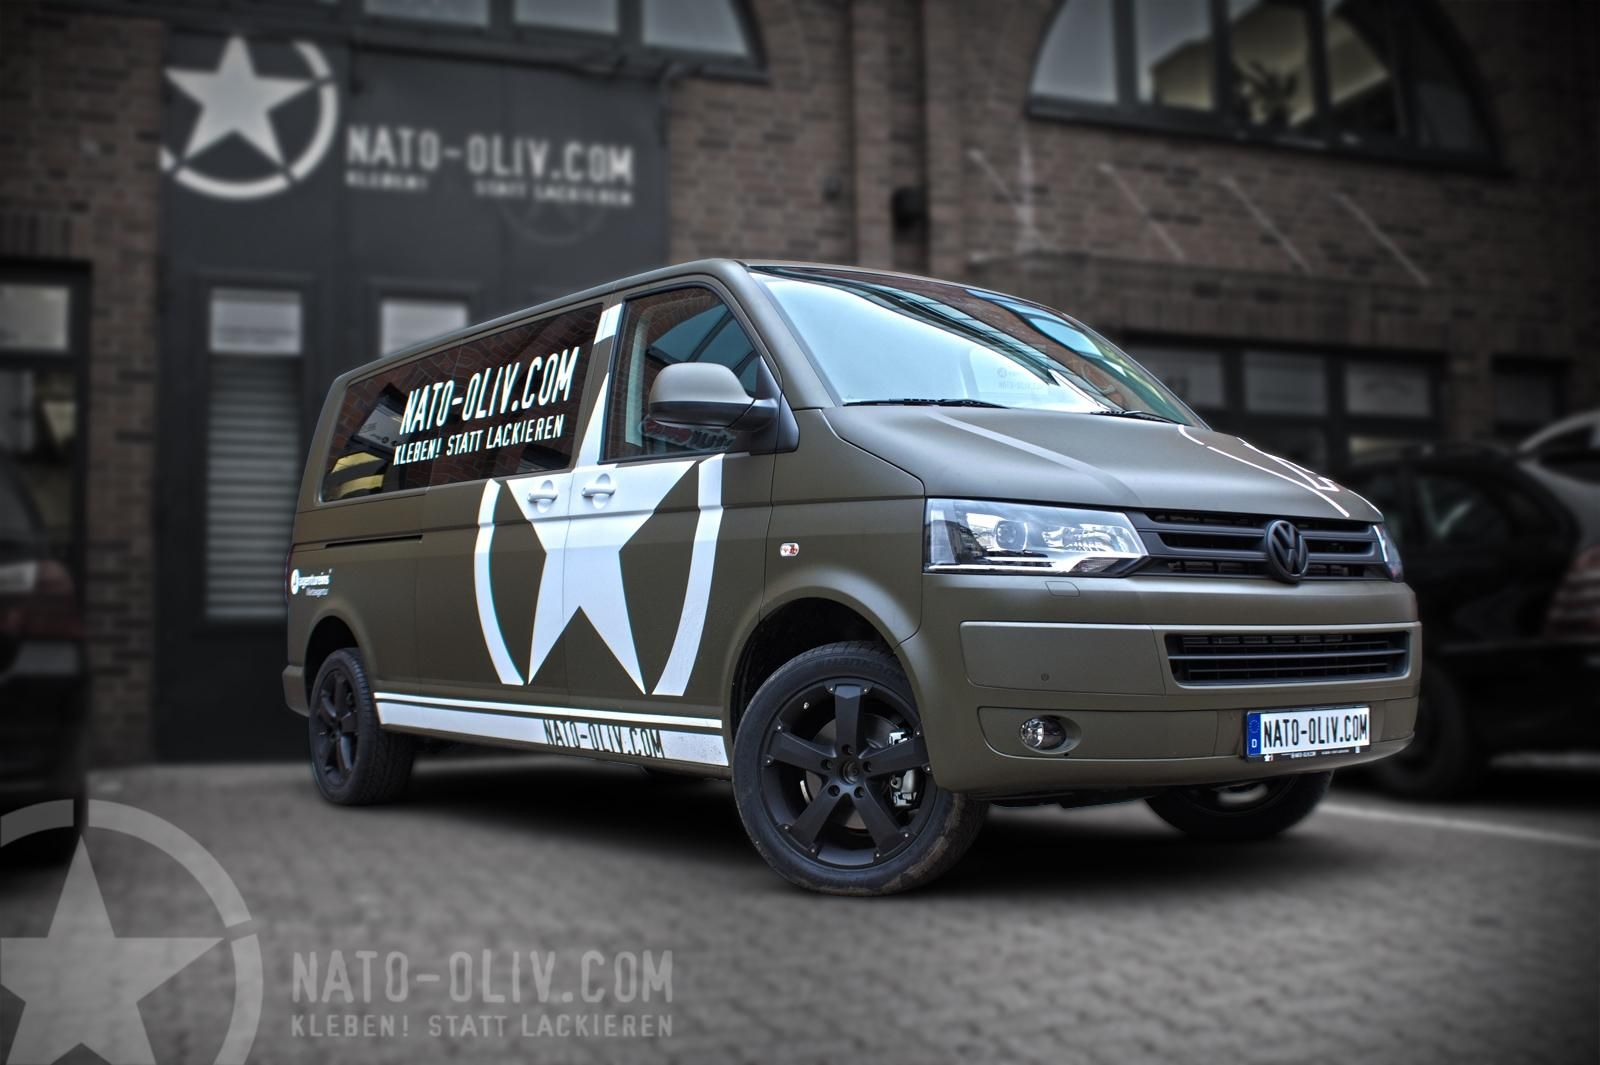 Vw T5 In Nato Oliv Nato Oliv Com Fahrzeugbeklebung Autos Folieren Autobeklebung